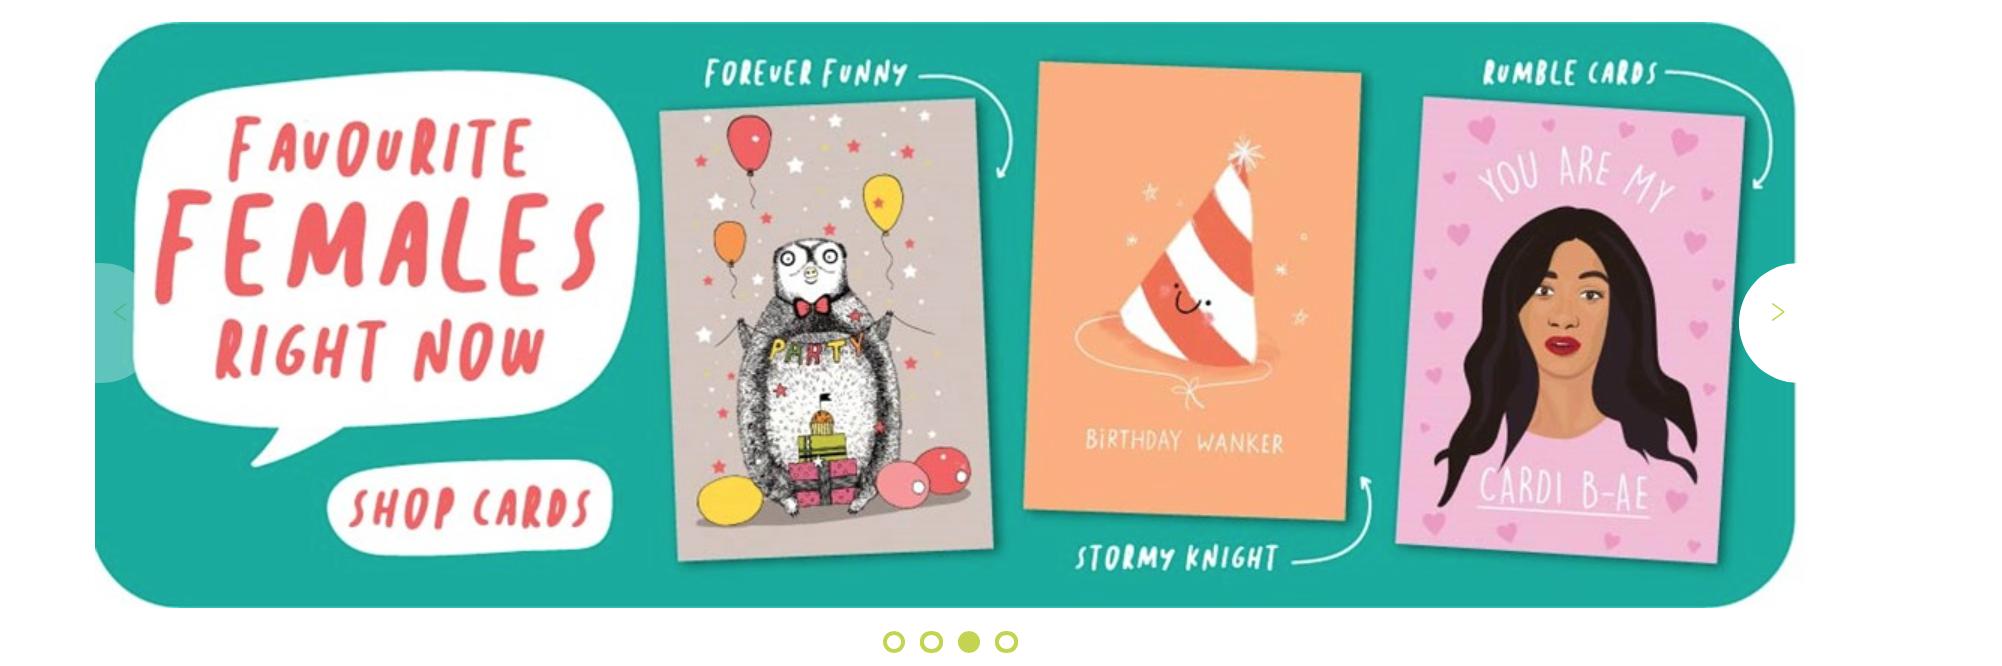 Above: Female designers are promoted on Scribbler's website.